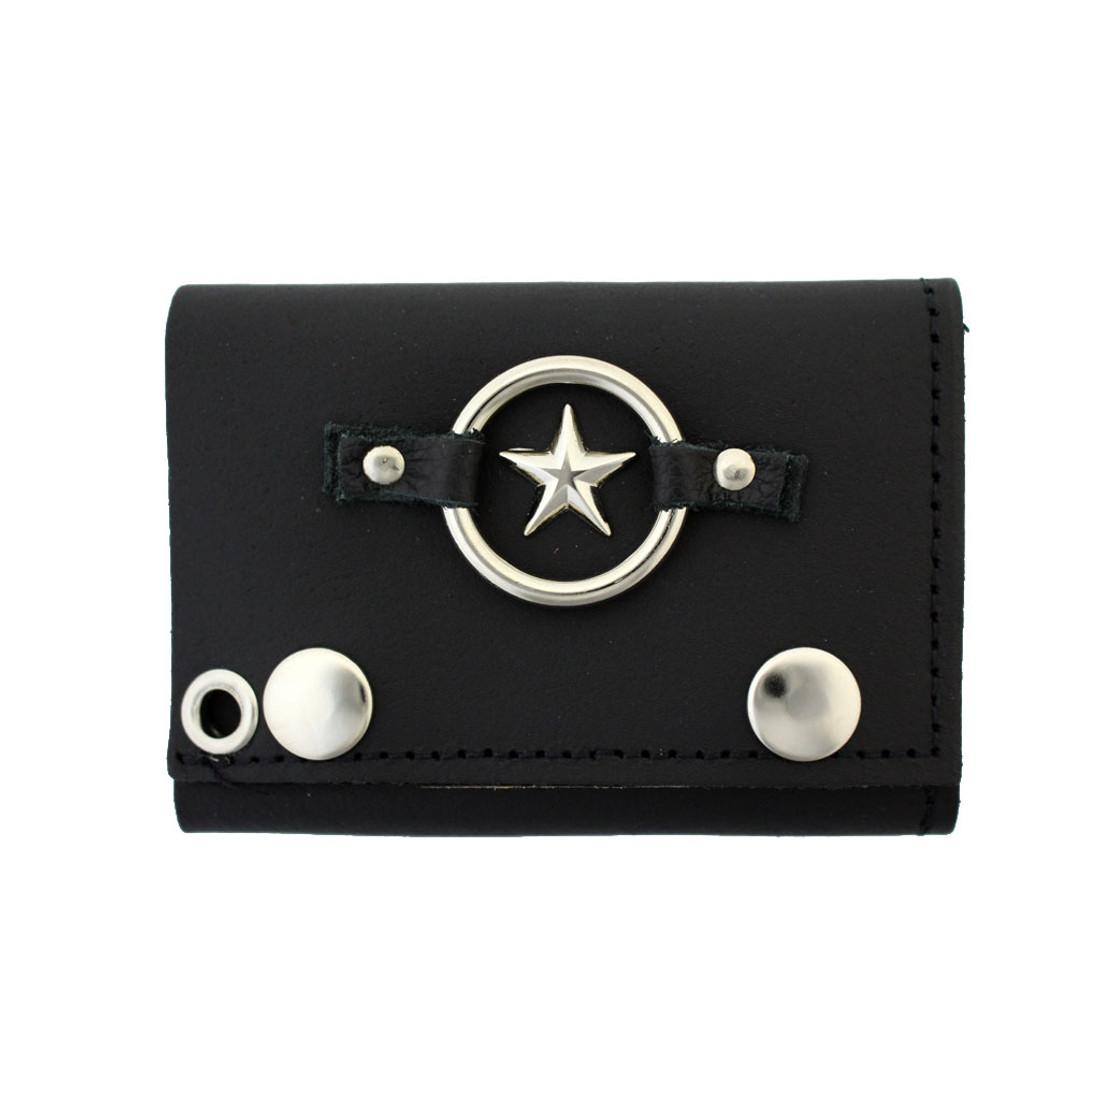 Men's Black Leather Wallet Chain Biker Trifold with Star Emblem